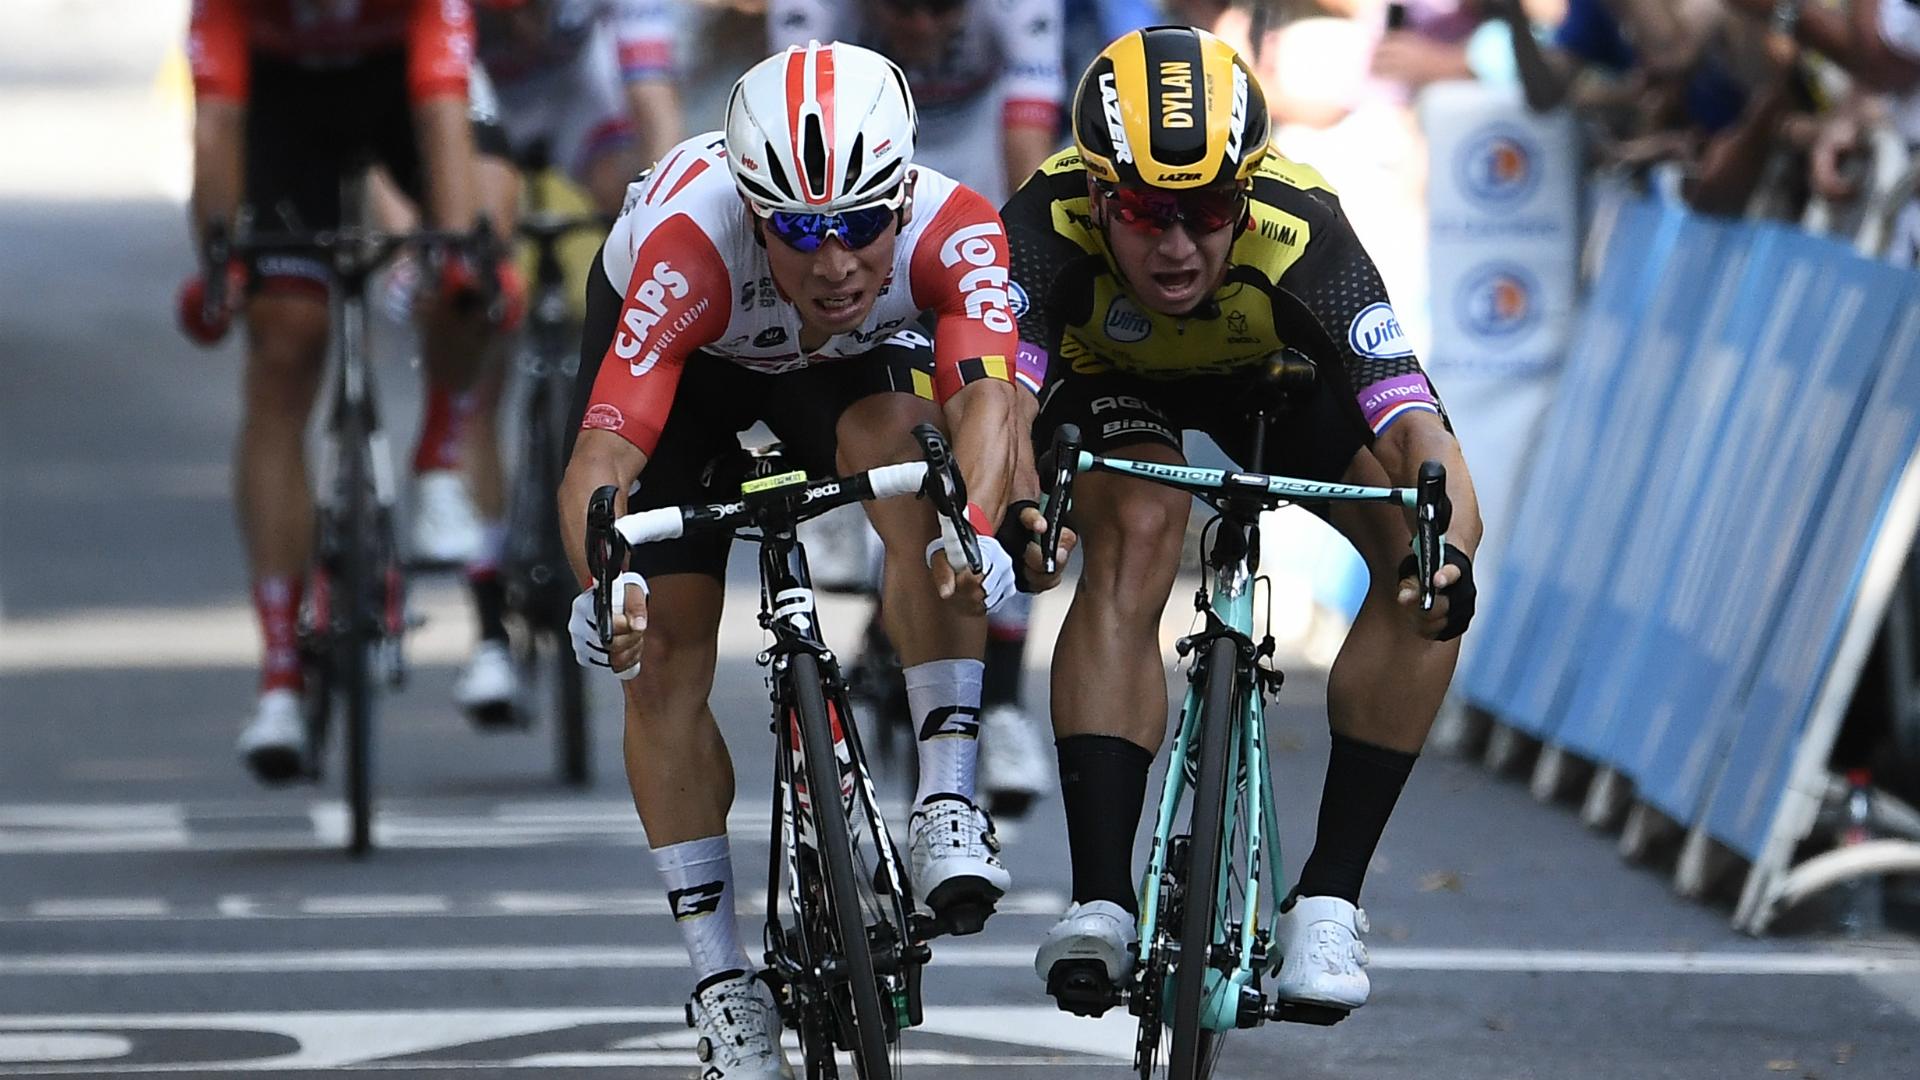 Ewan triumphs in tight stage 11 sprint finish